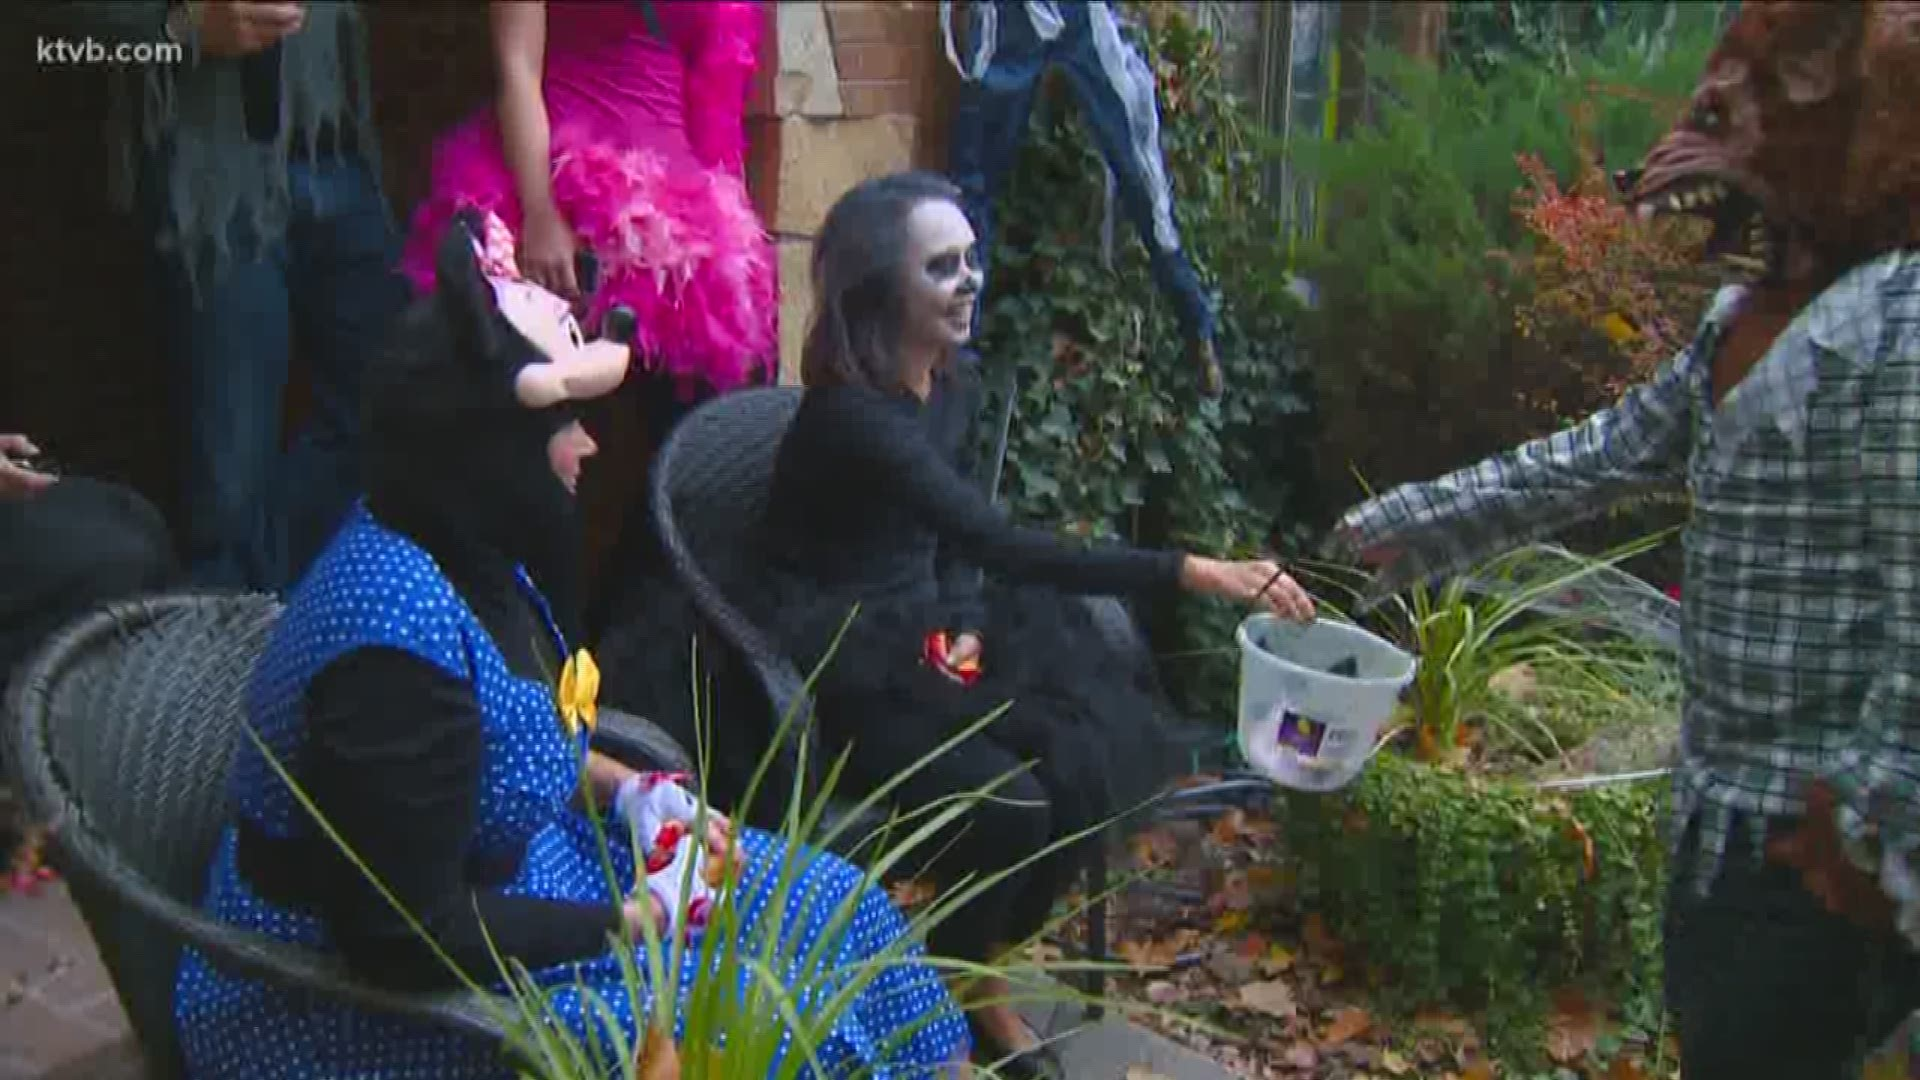 2020 Harrison Blvd Halloween Boise Idaho From pumpkins to disco balls, Harrison homeowner starts new